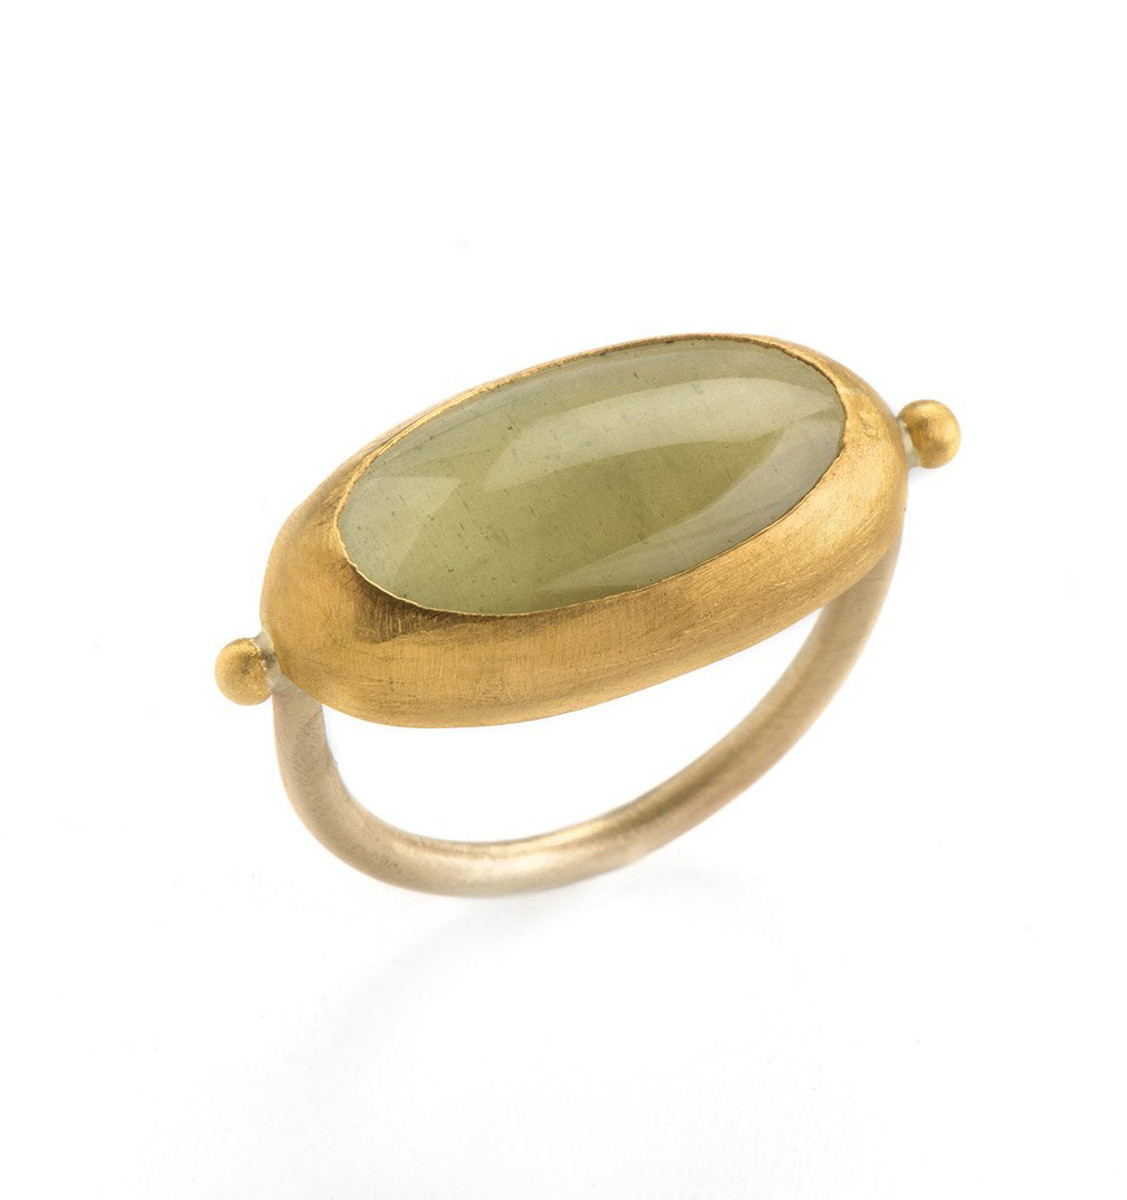 Courages Aquamarine Gold Ring by Nava Zahavi - New Arrival